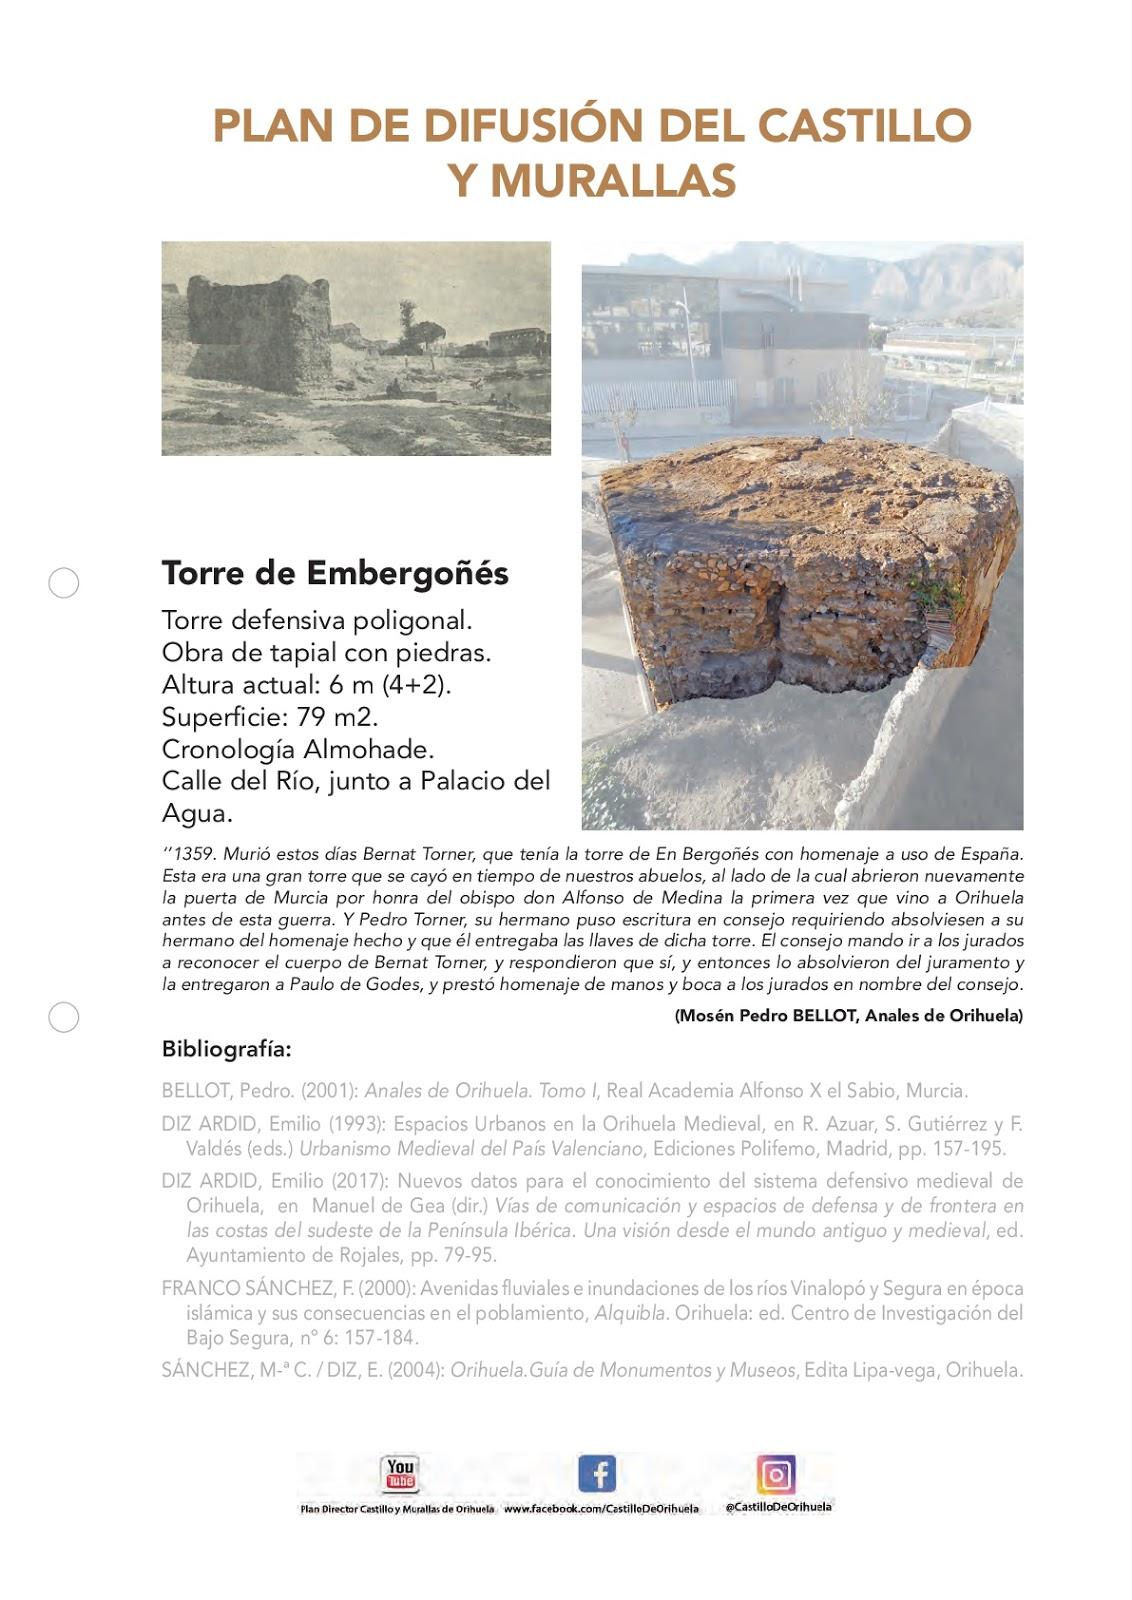 torre_embergones